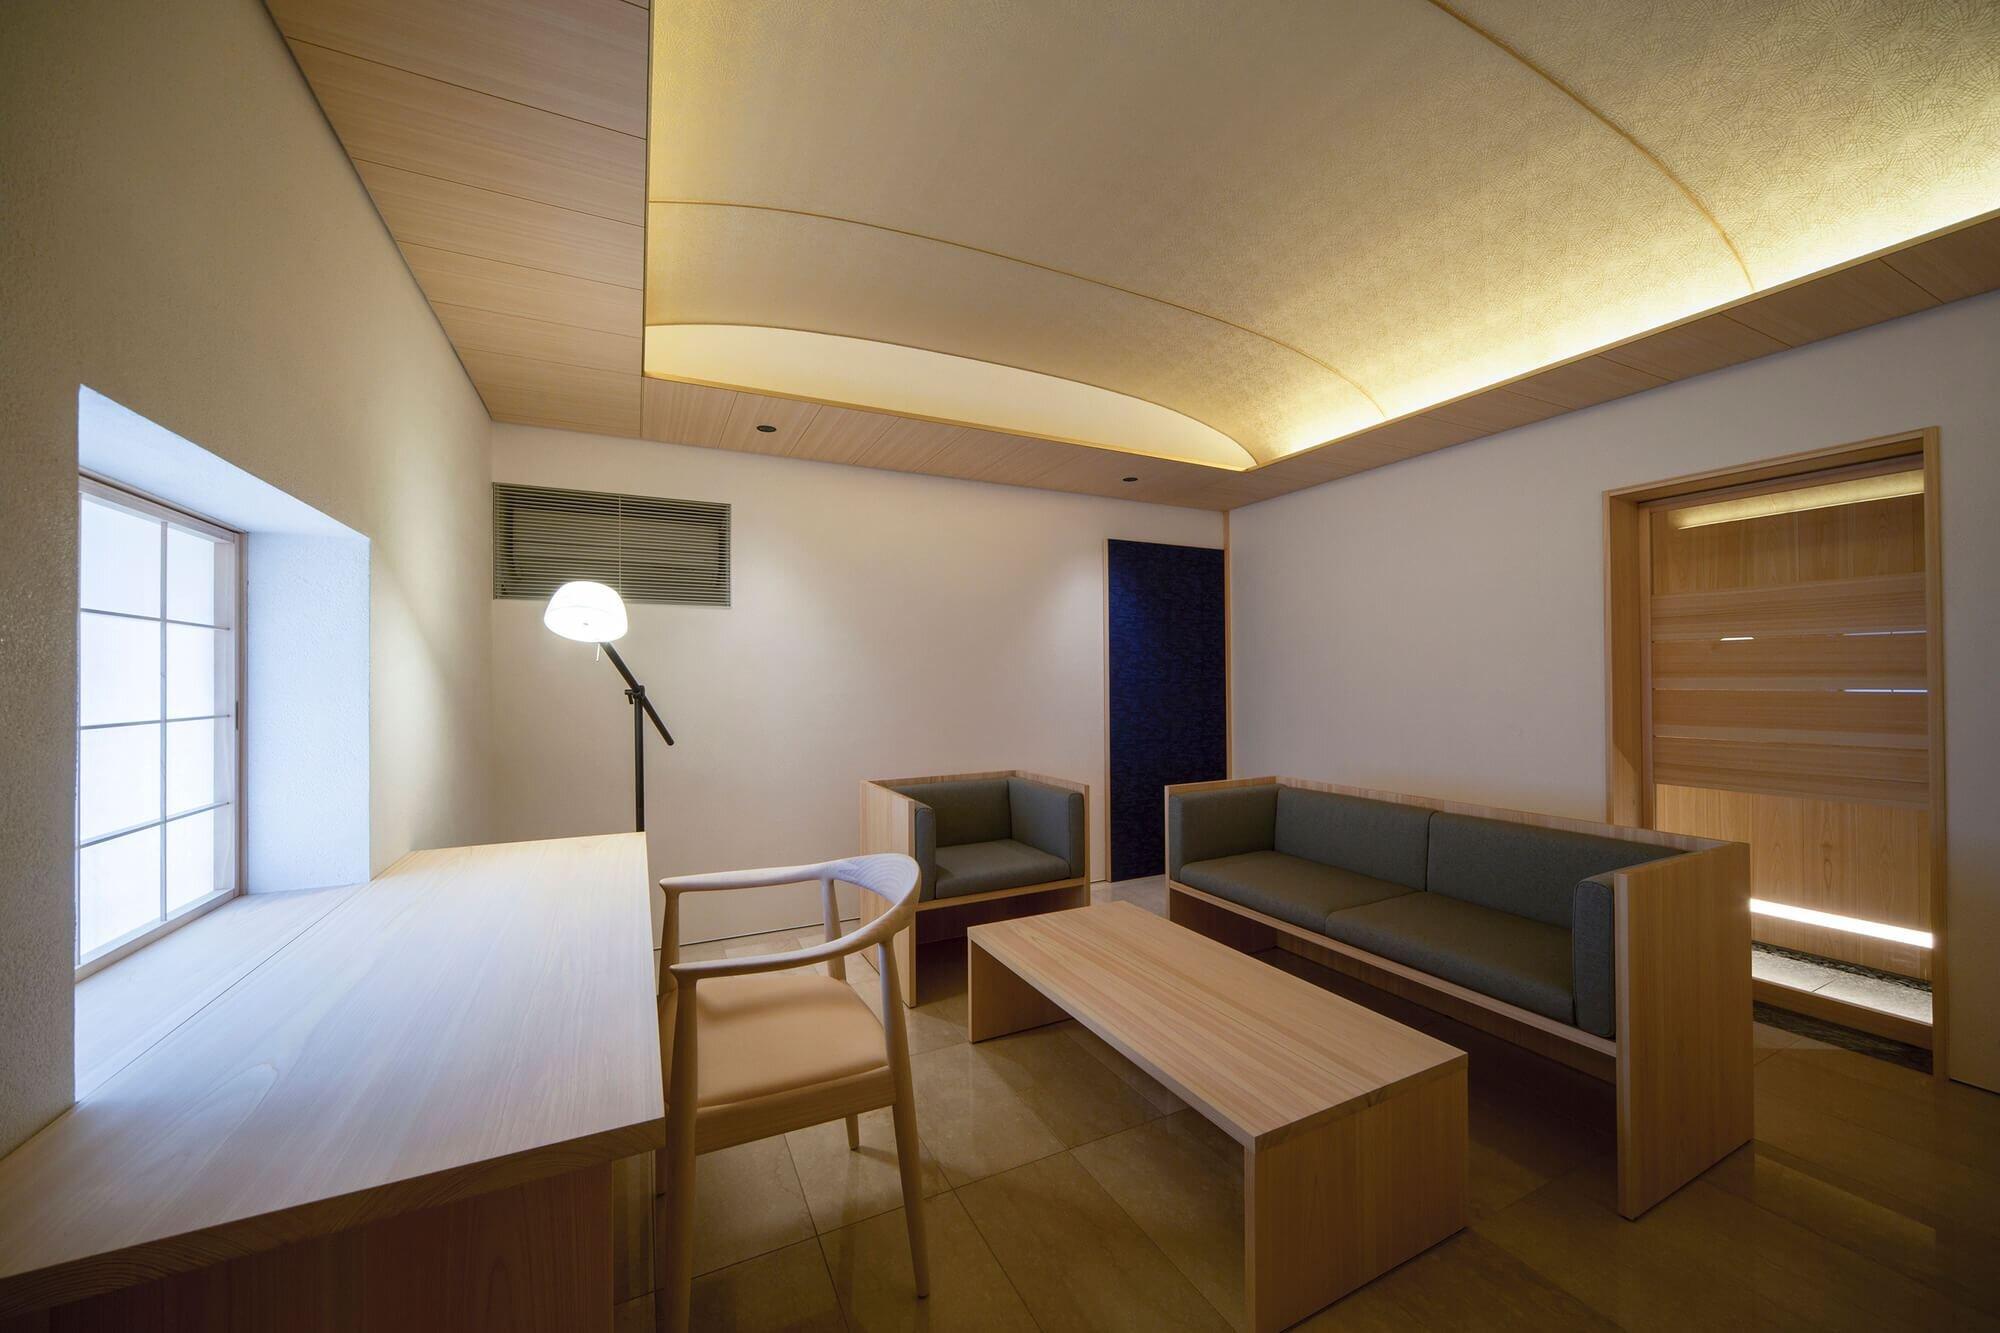 Oukikyo-Atsumasa-Tamura-Design-Office-Japan-13